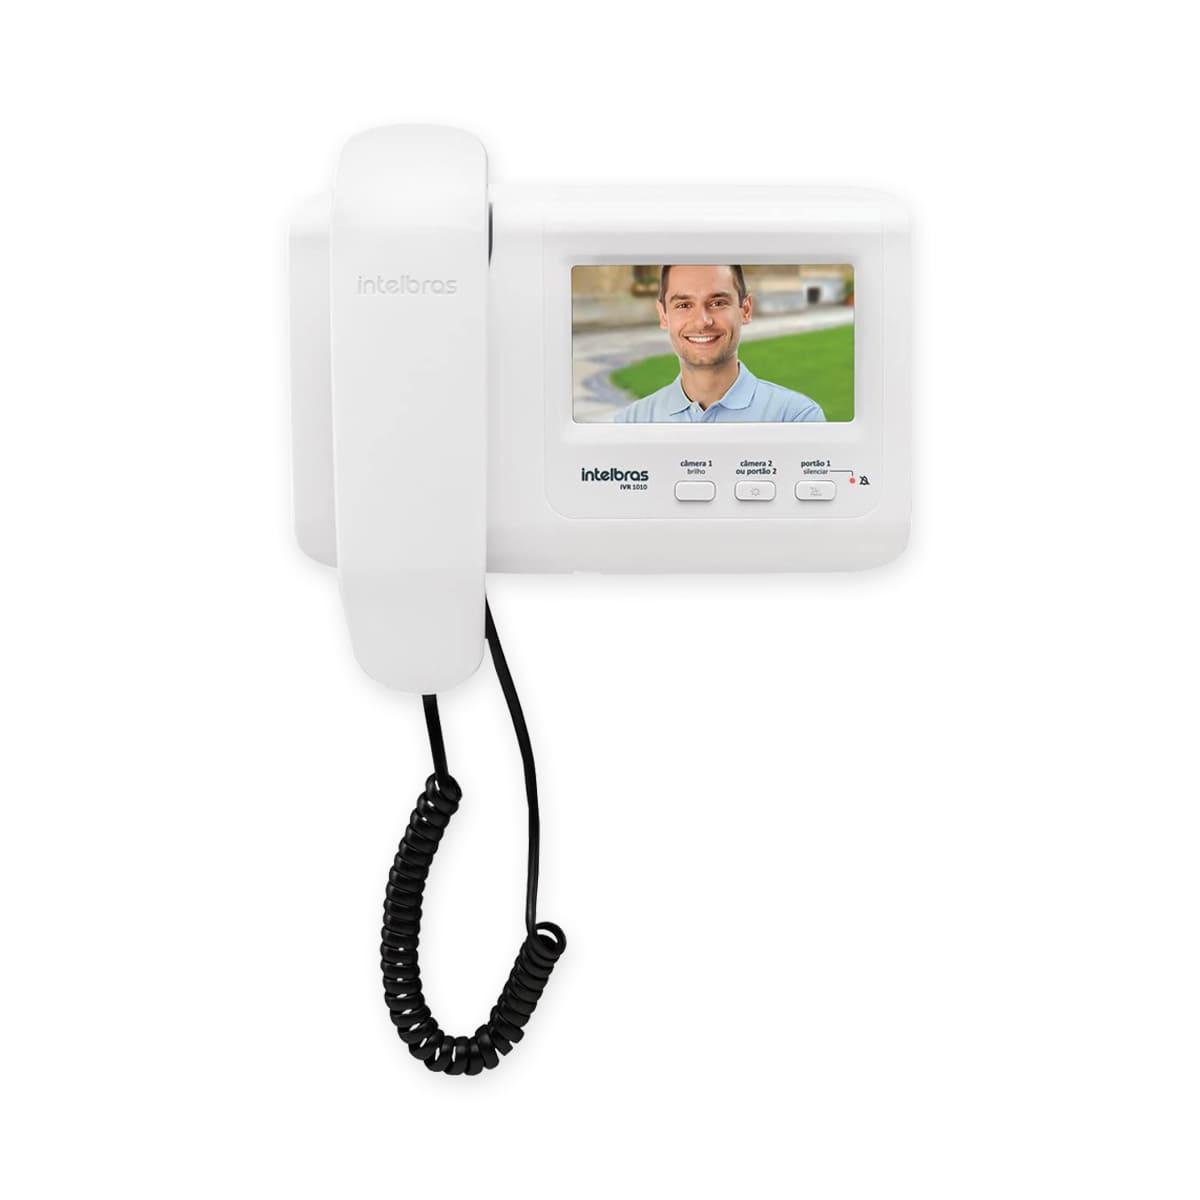 Kit Interfone com Câmera Intelbras IVR 1010 e Fechadura Elétrica FX 500